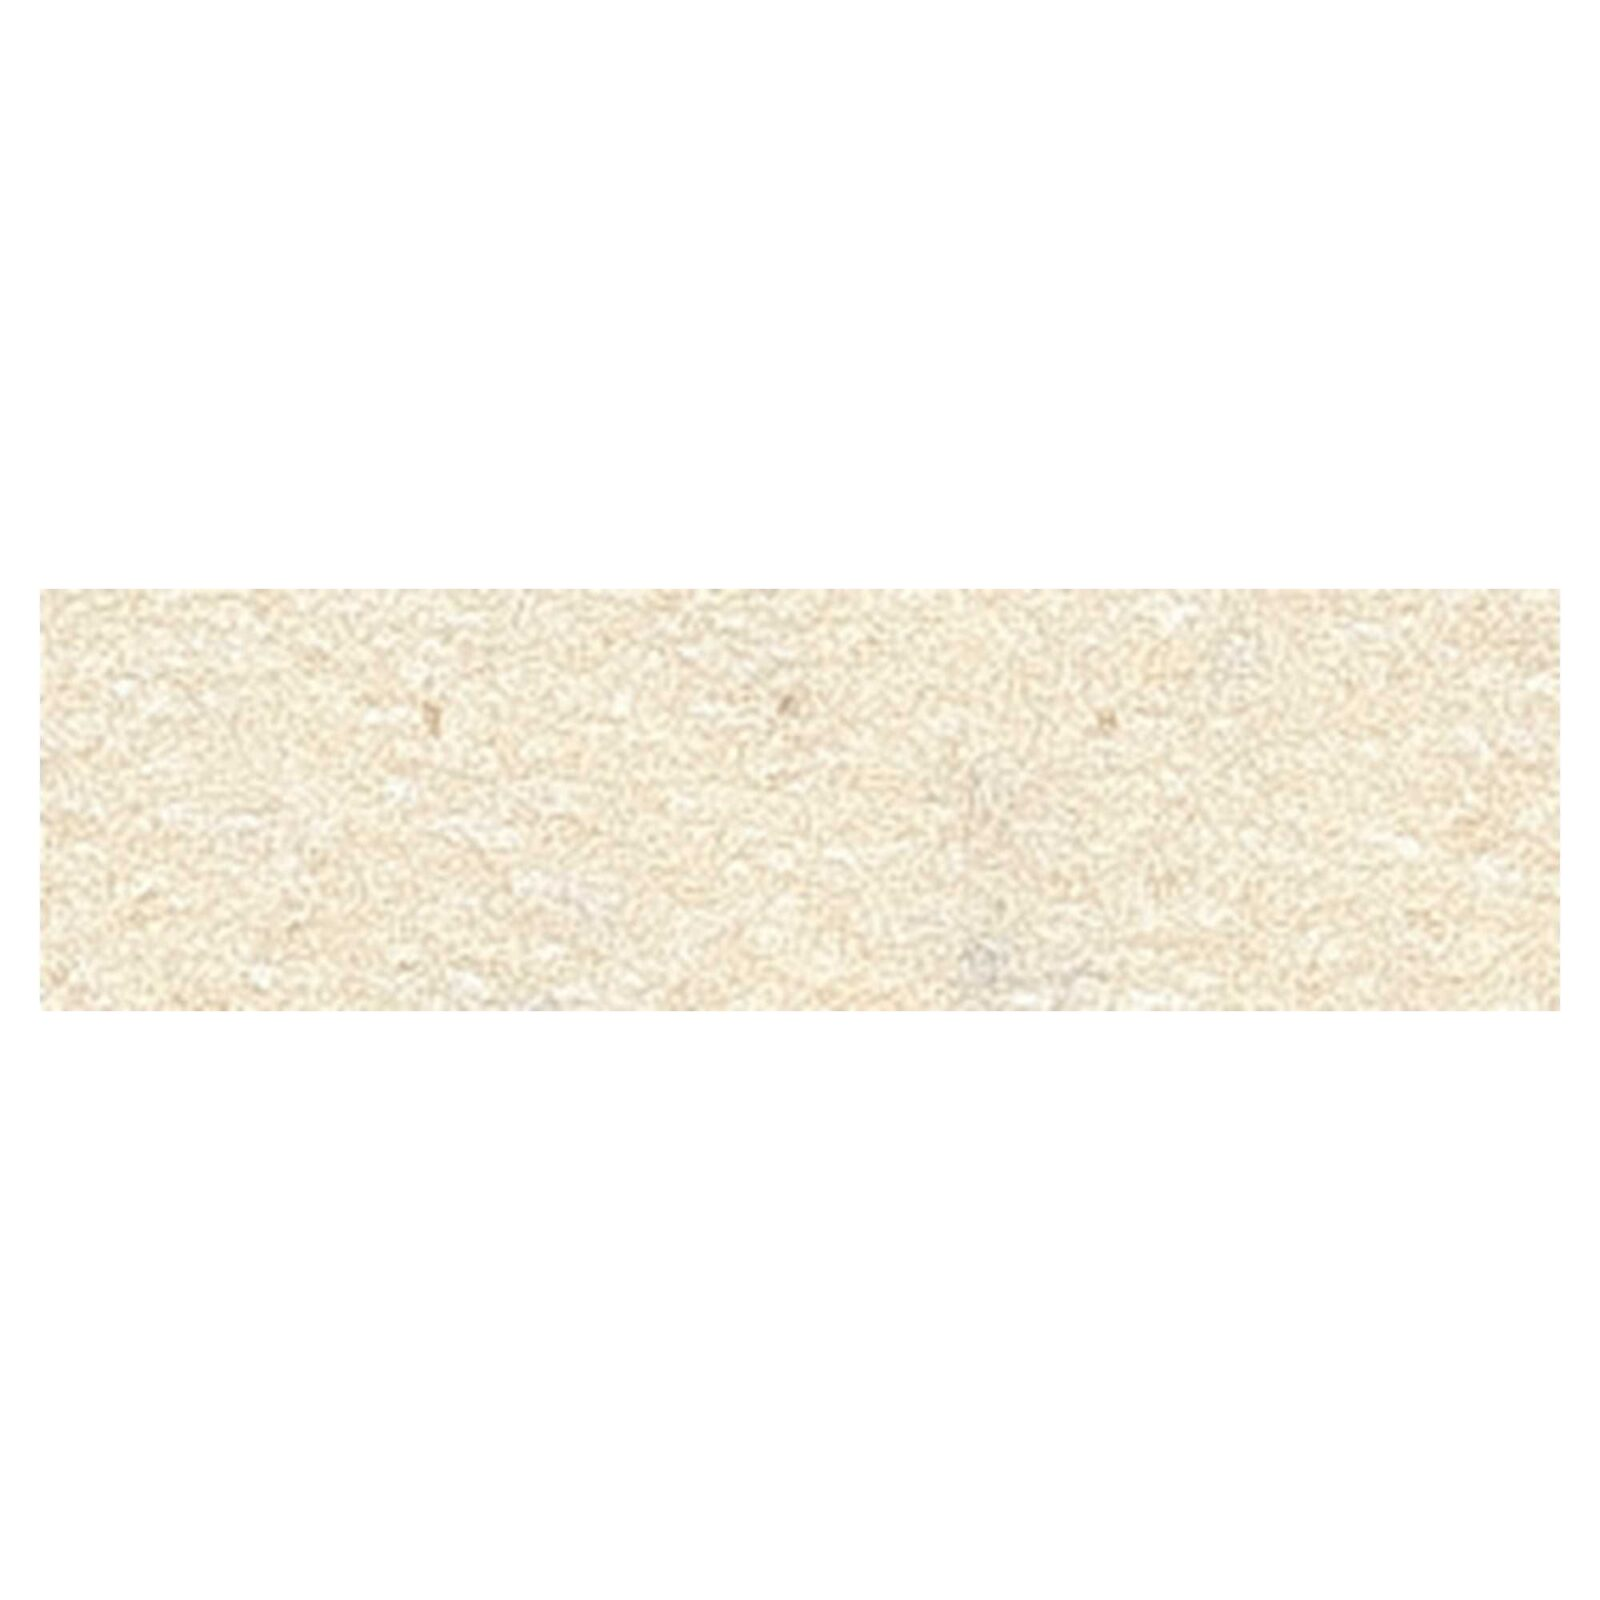 Мойка G-5(сахара) (800х485х180) из гранитной крошки+сифон